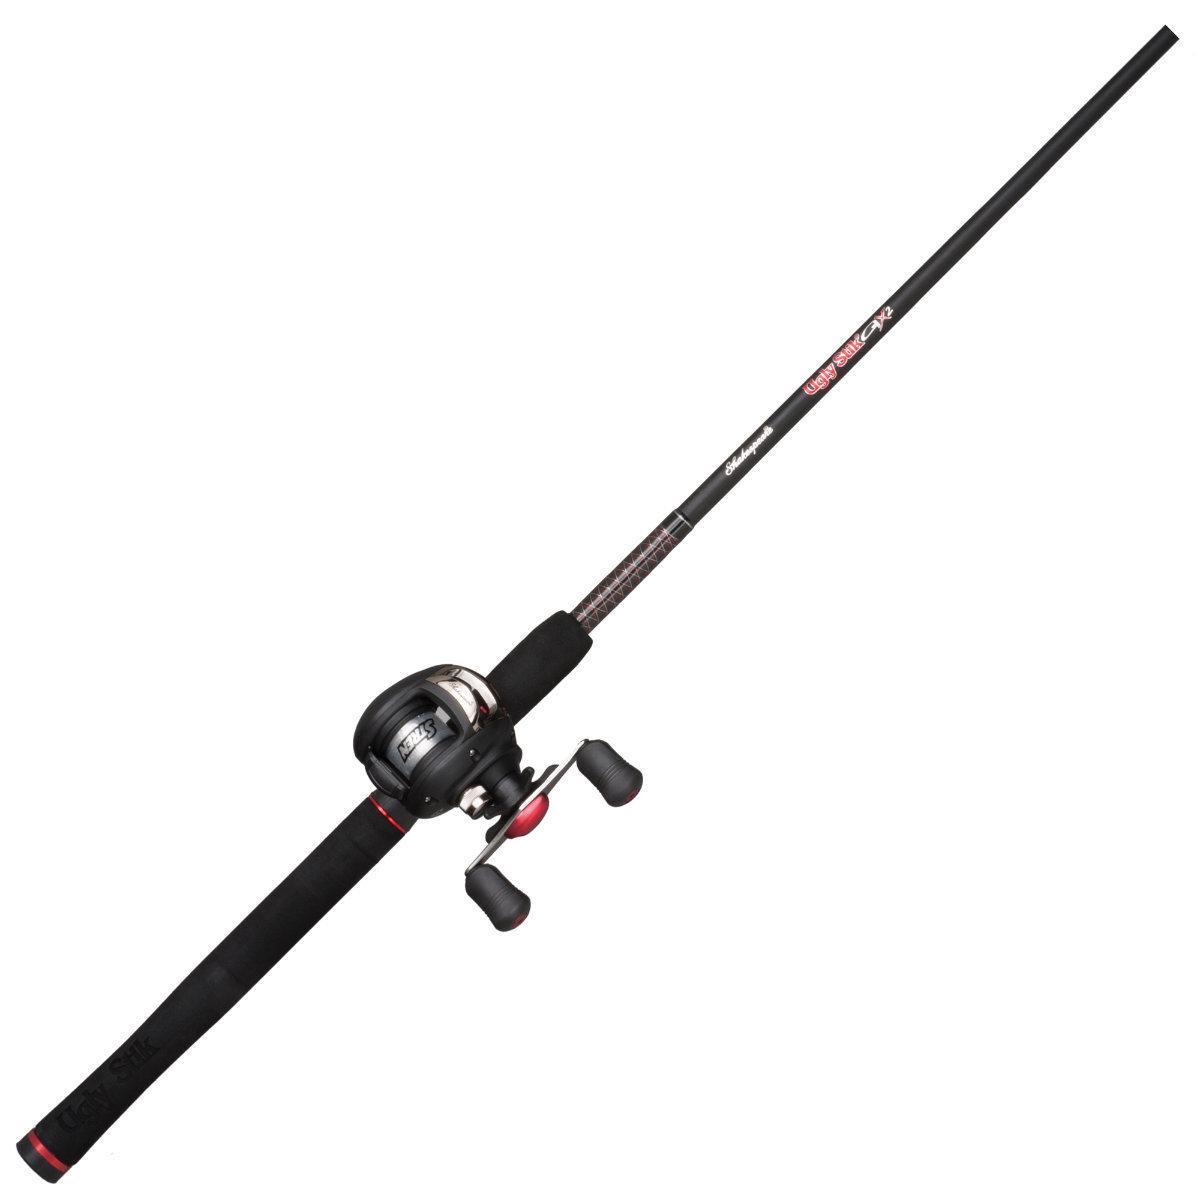 Fishing rod reel baitcast combo shakespeare ugly stik for Fishing pole combo